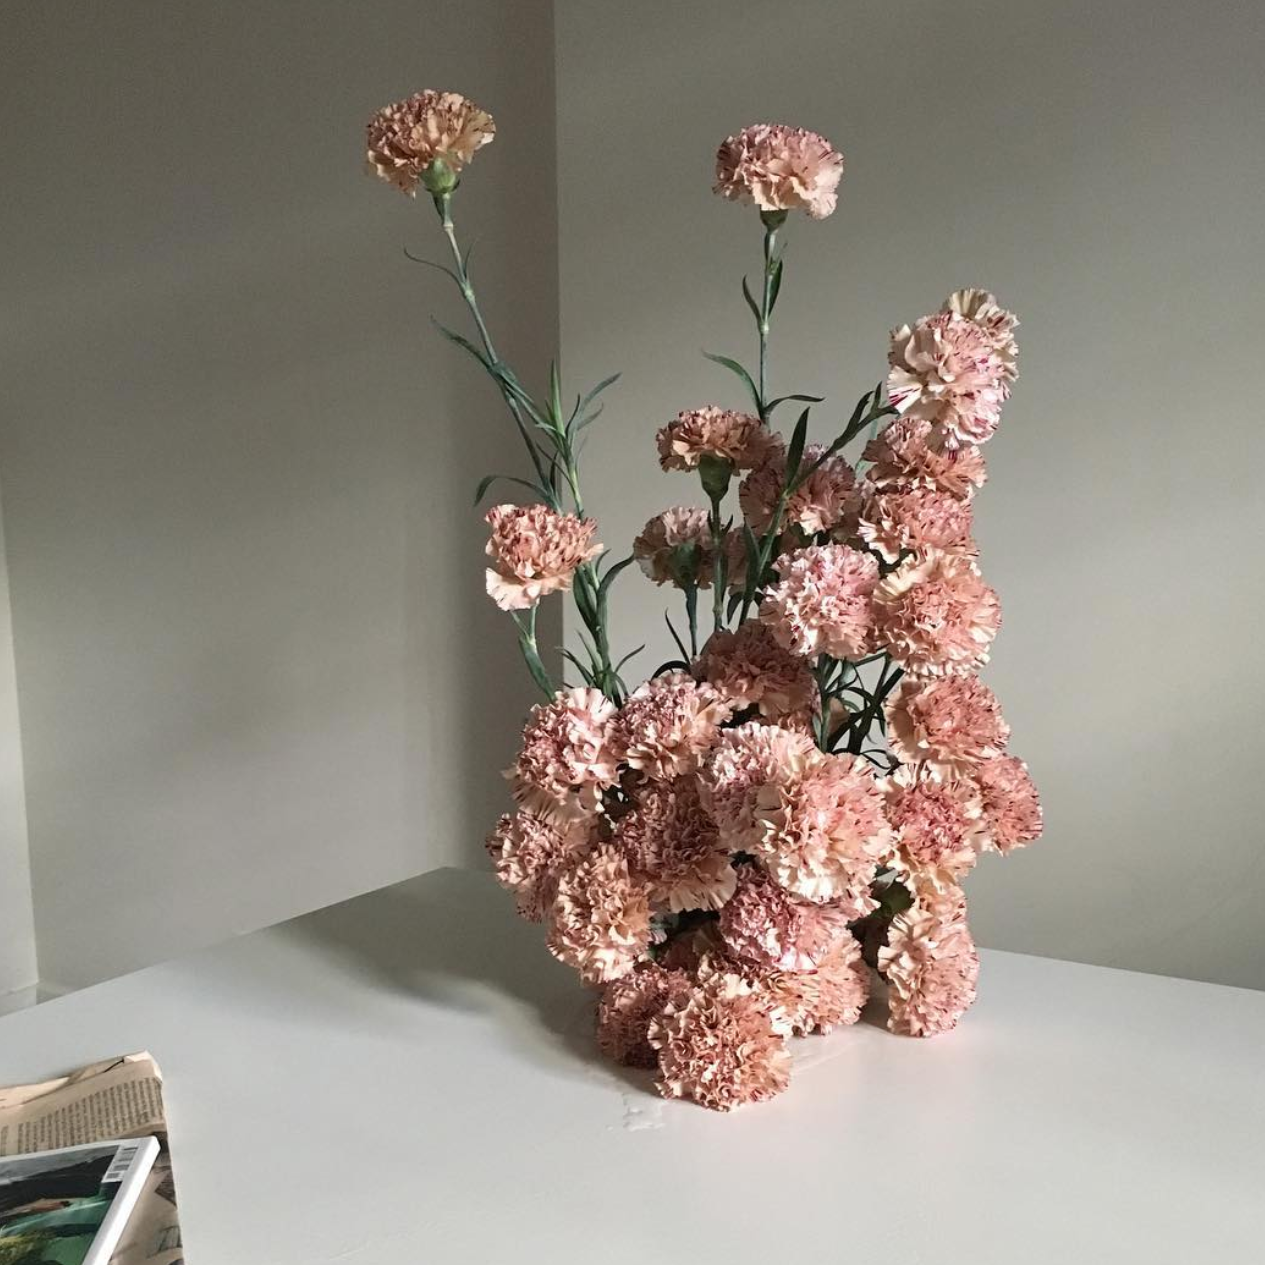 Fjura-London-simple-minimalist-flower-arrangement-display-installations-chanel-gucci-glossier-hermes-wedding-private-events-queensmith-master-jewellers-hatton-garden-london-bridal-engagement-ring-wedding-ring